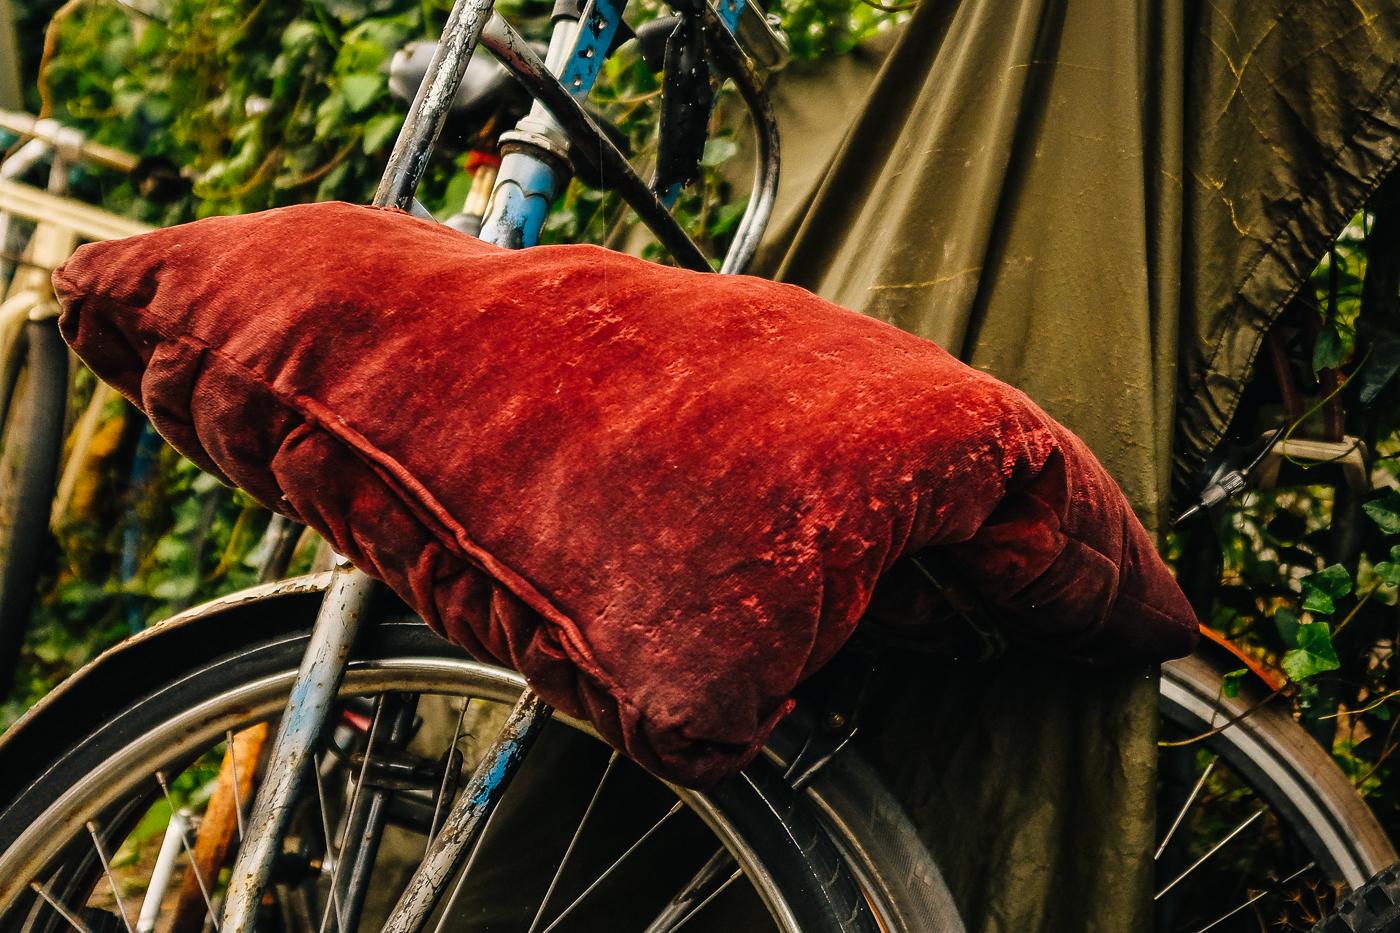 hb images - Amsterdam bike - 5